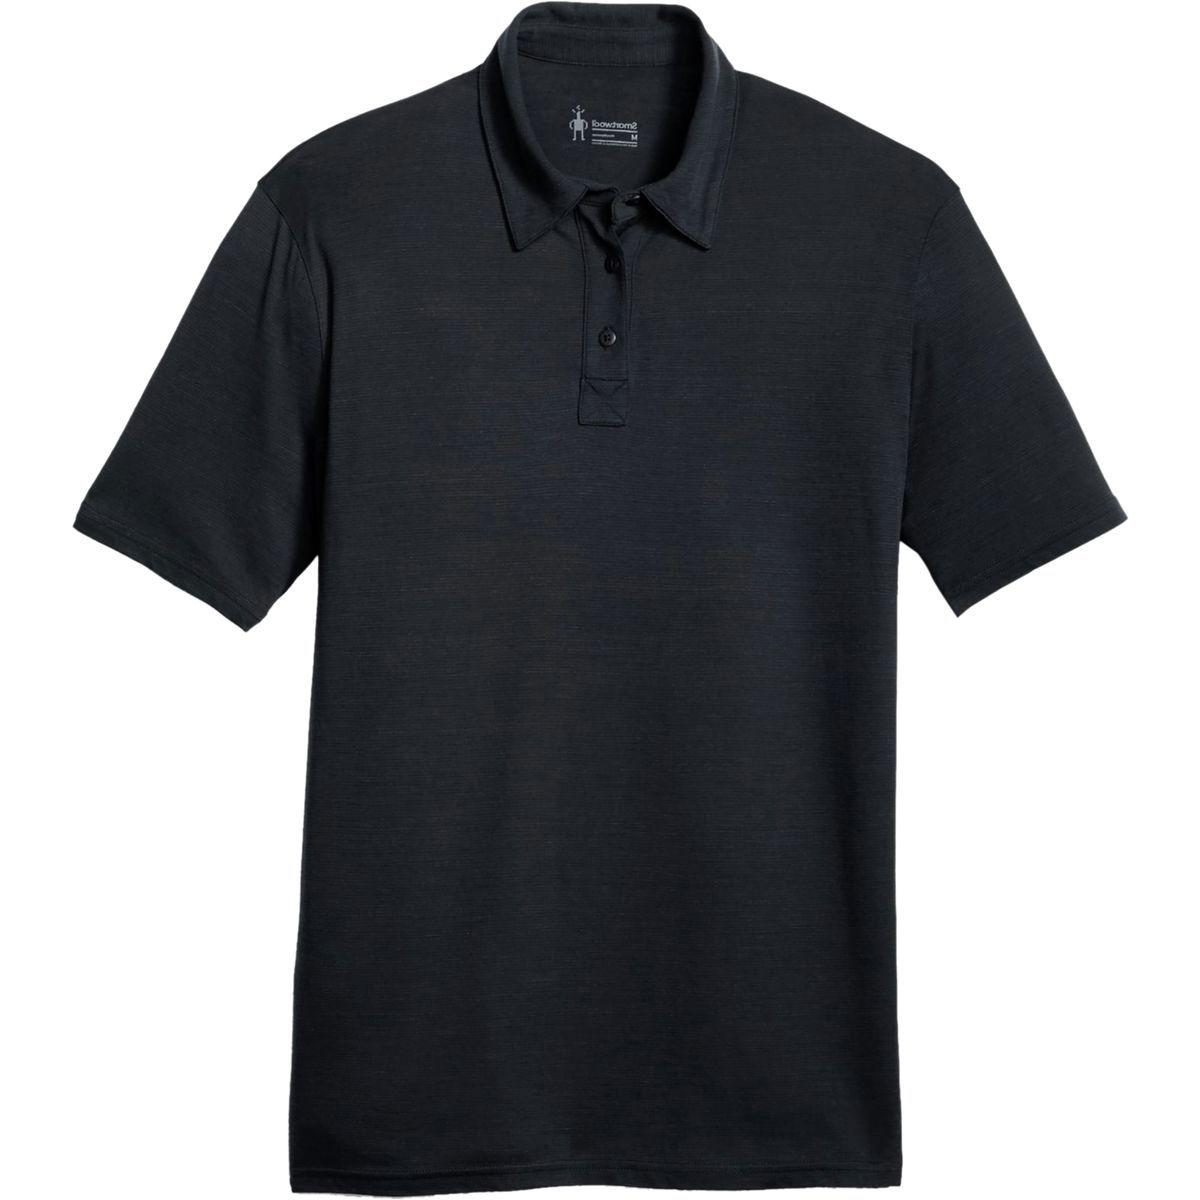 Smartwool Merino 150 Pattern Polo Shirt - Men's